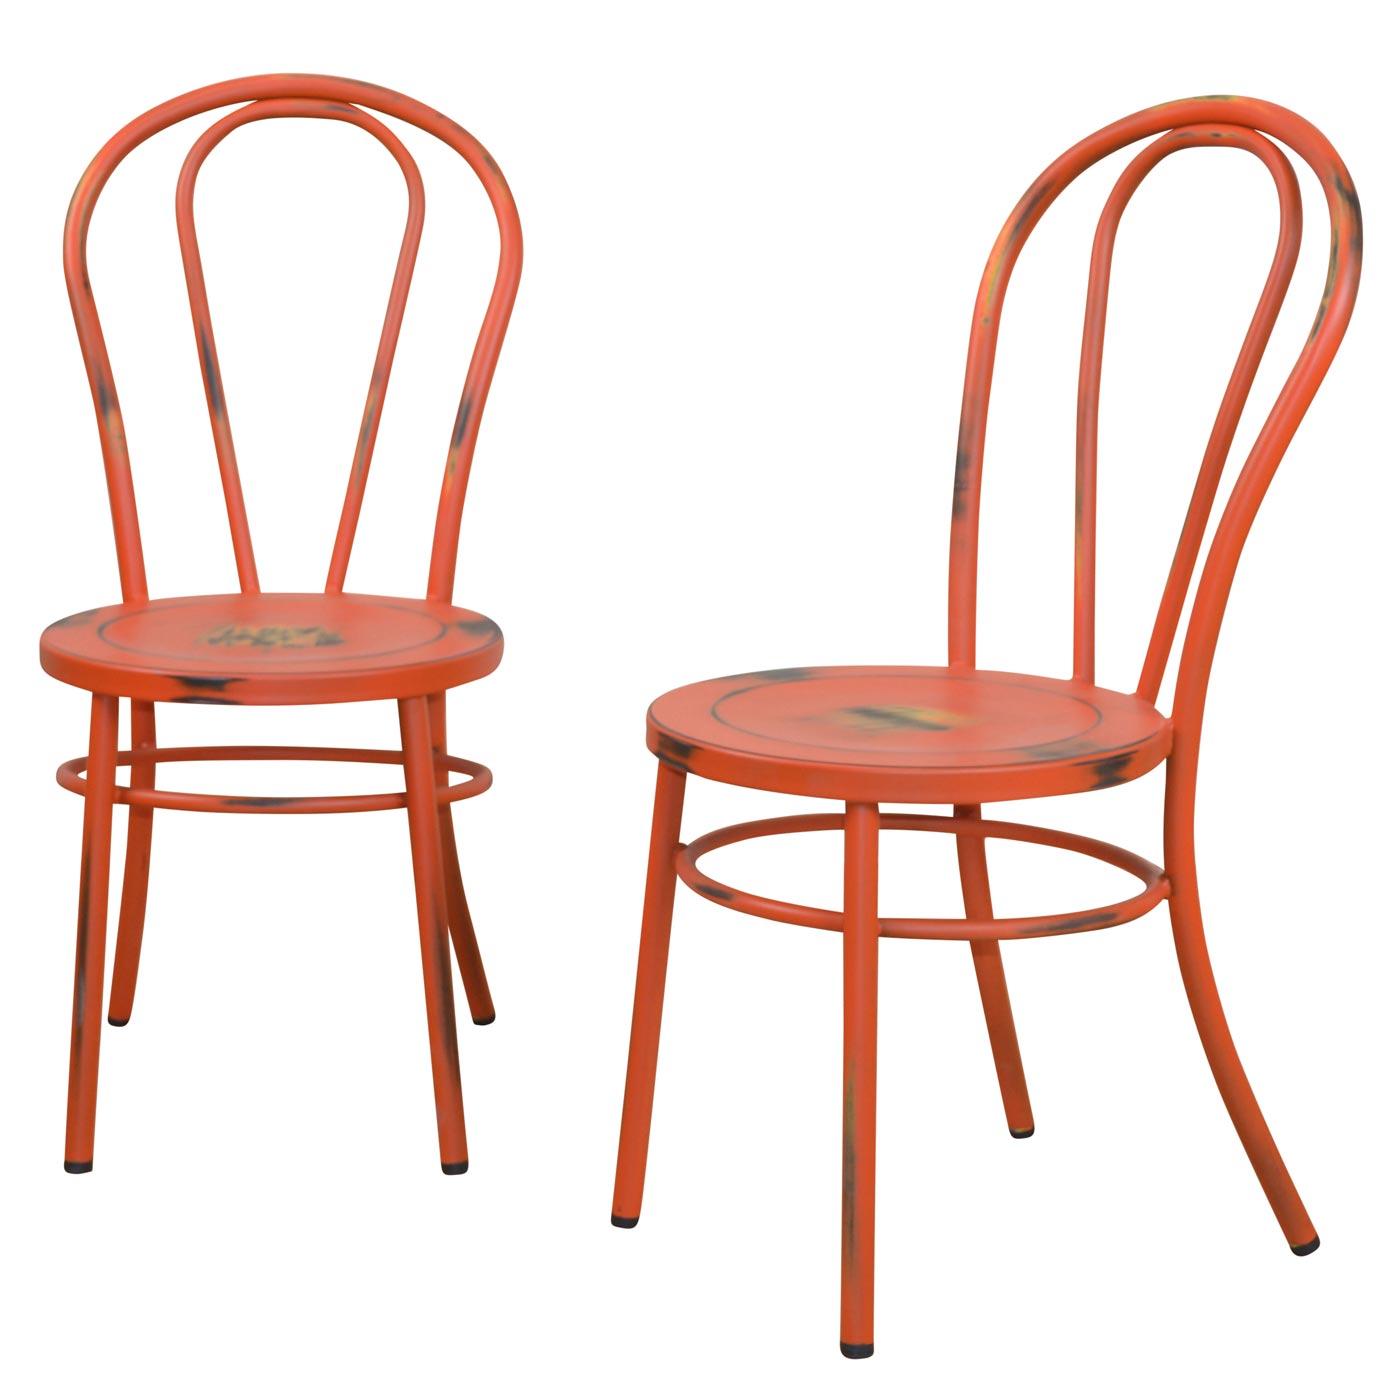 Liebenswert Metall Stuhl Ideen Von 2x Esszimmerstuhl H160, Lehnstuhl Metallstuhl, Shabby Look,